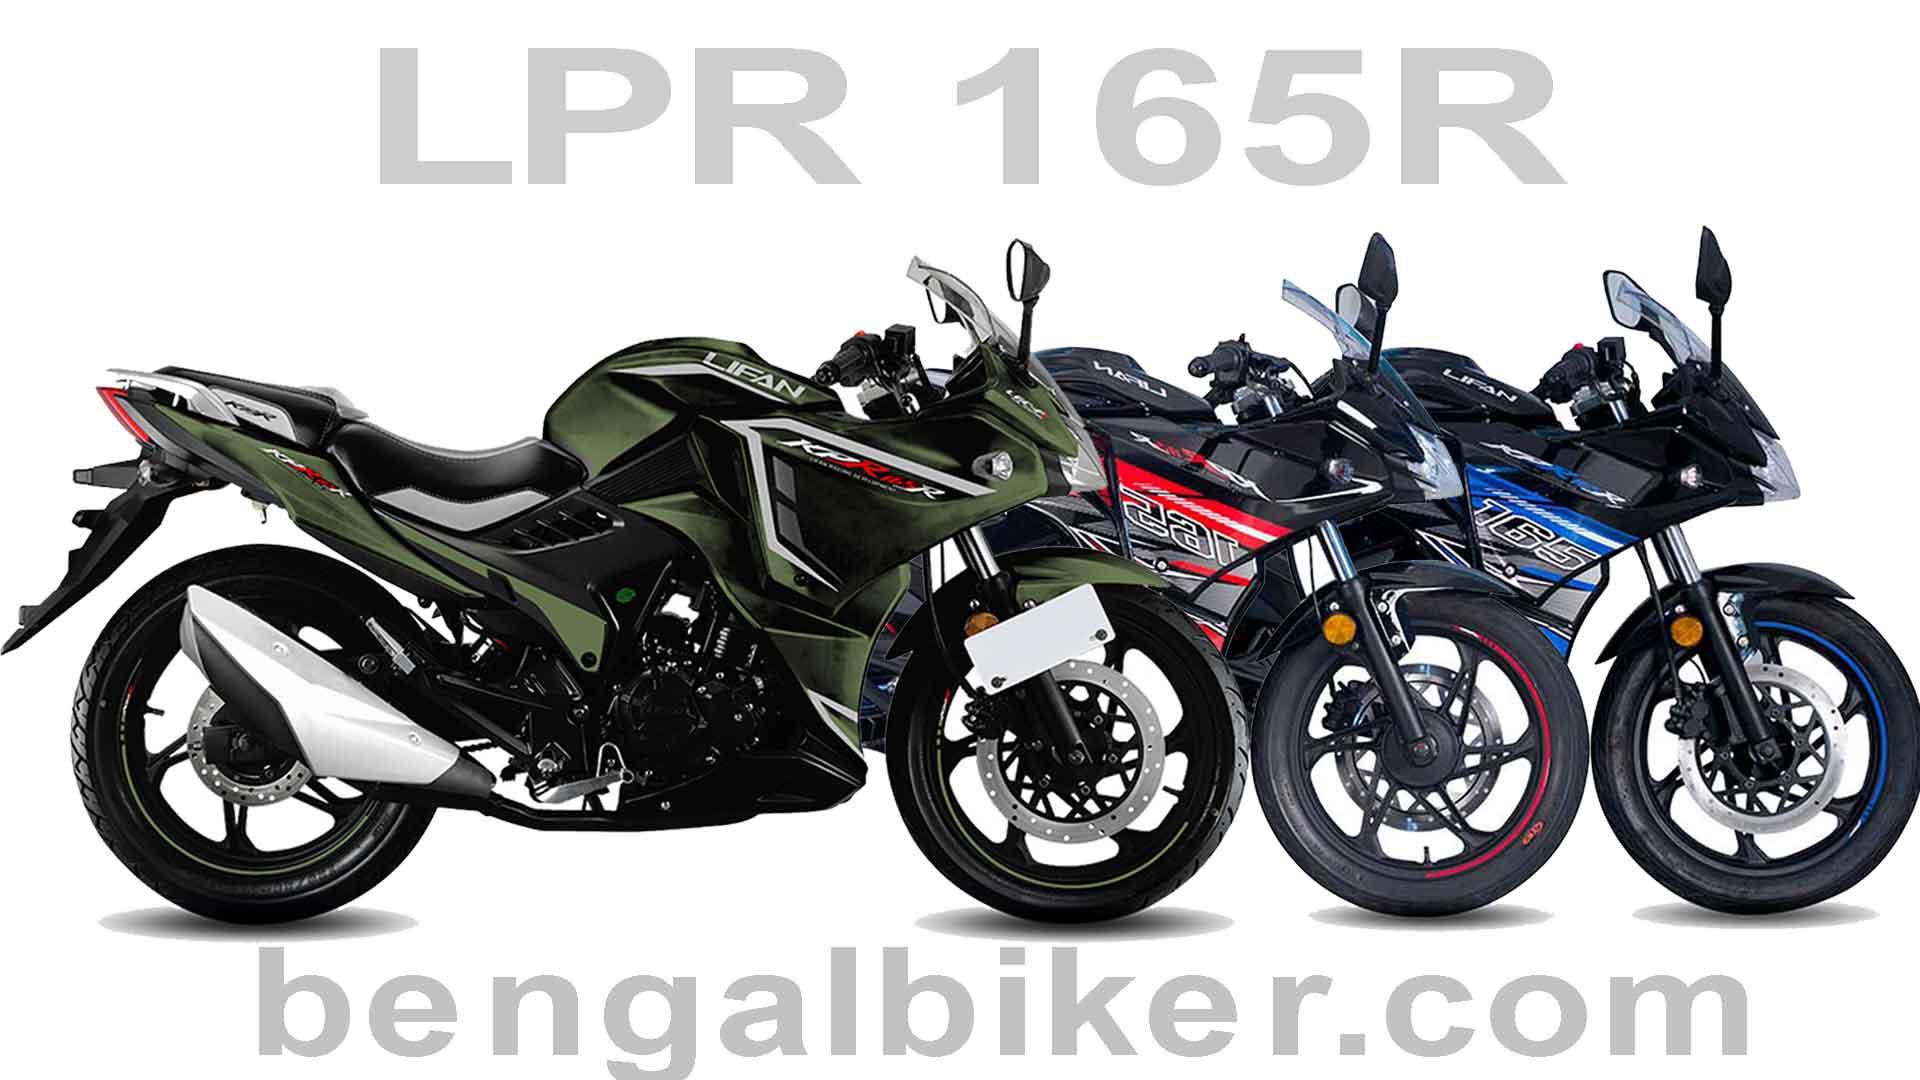 Lifan KPR 165R Price in Bangladesh 2021|Price, Spec, Mileage